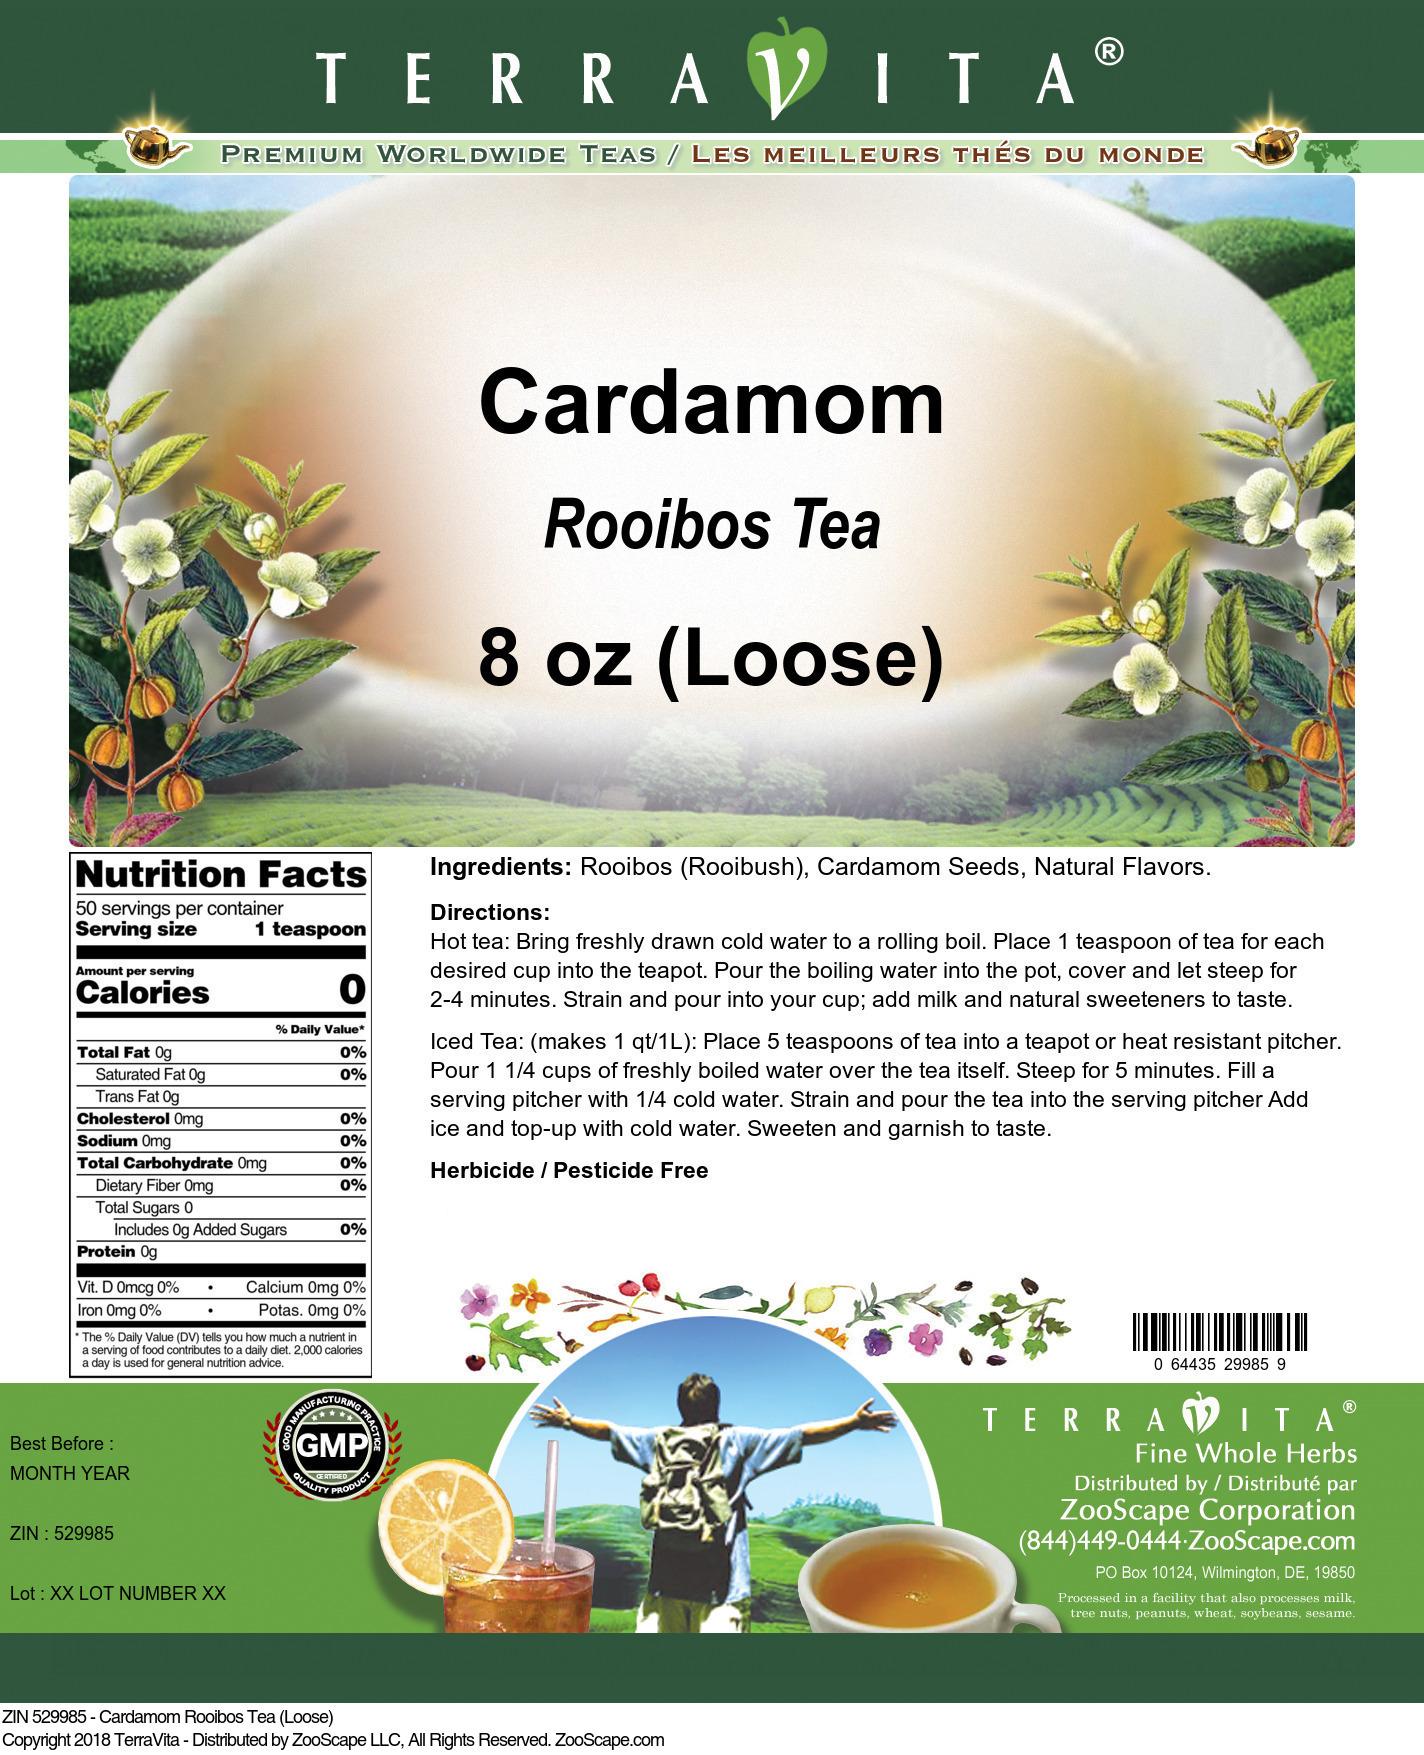 Cardamom Rooibos Tea (Loose)